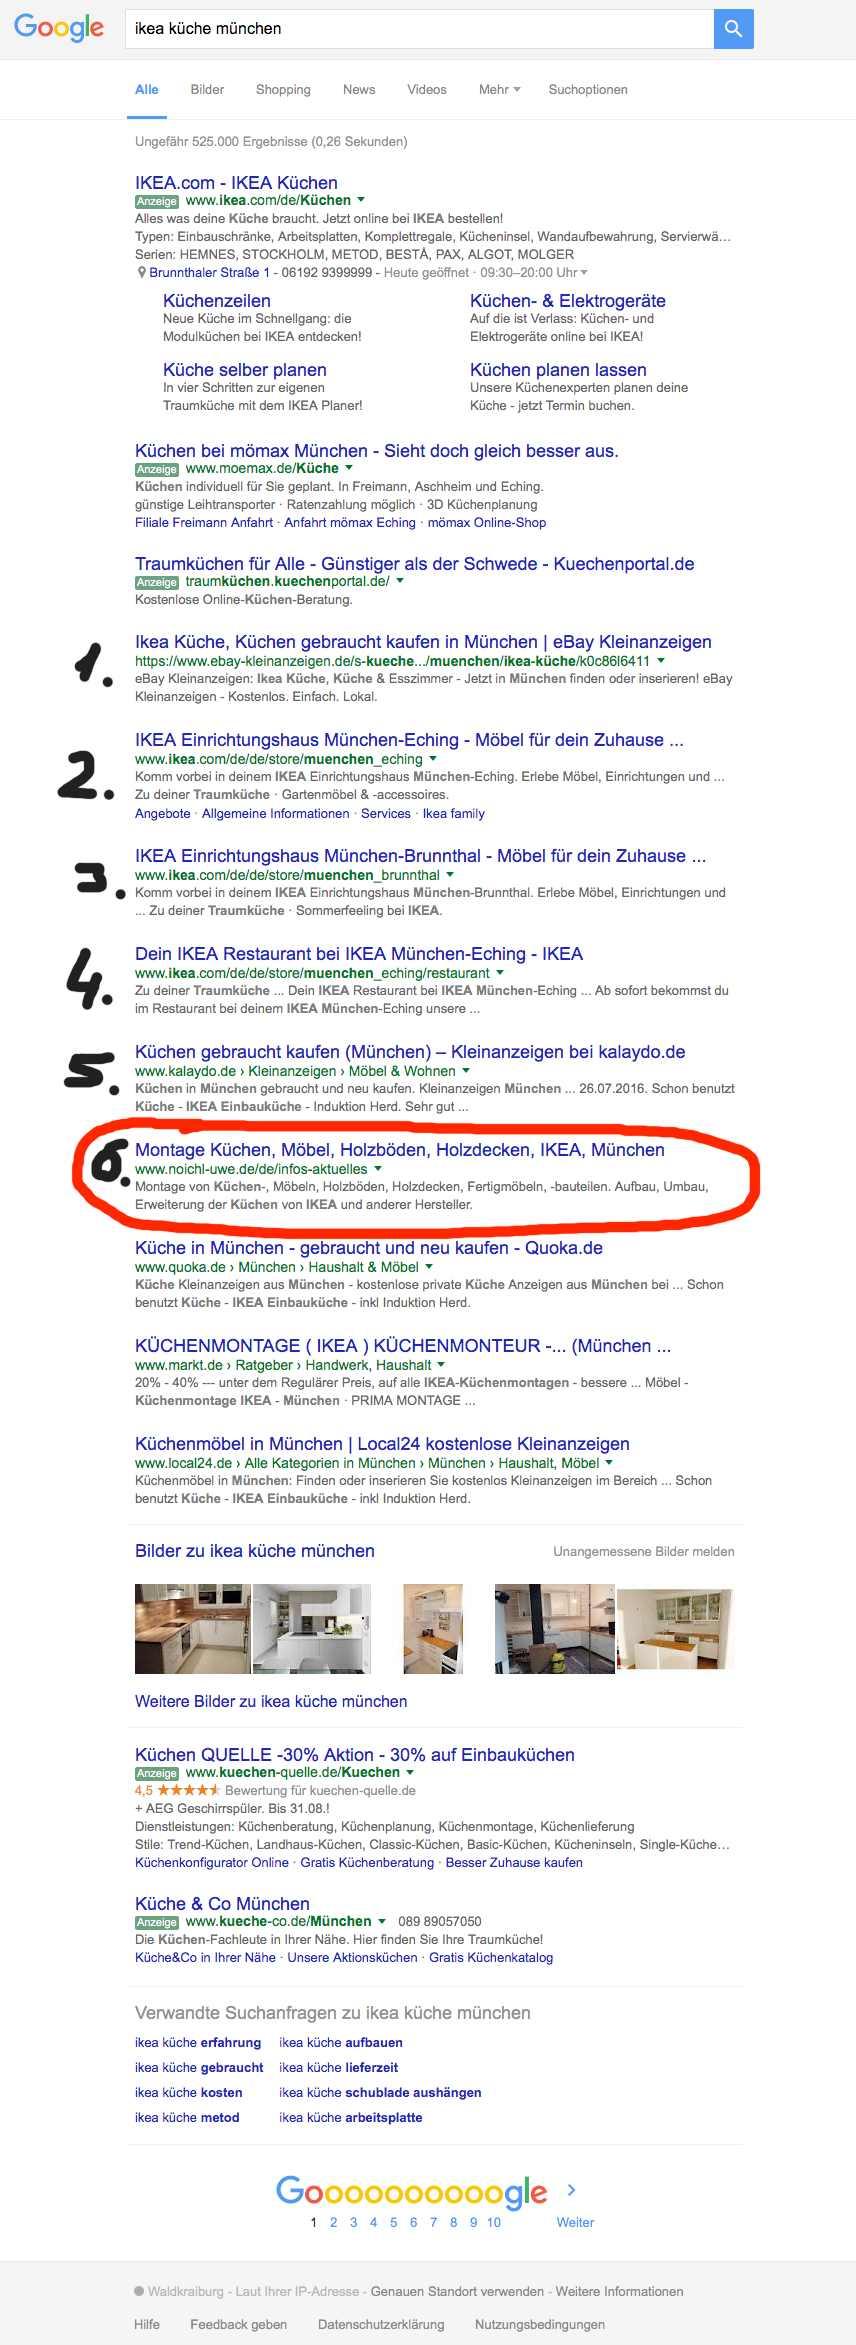 Uwe Noichl / noichl-uwe.de bei Google